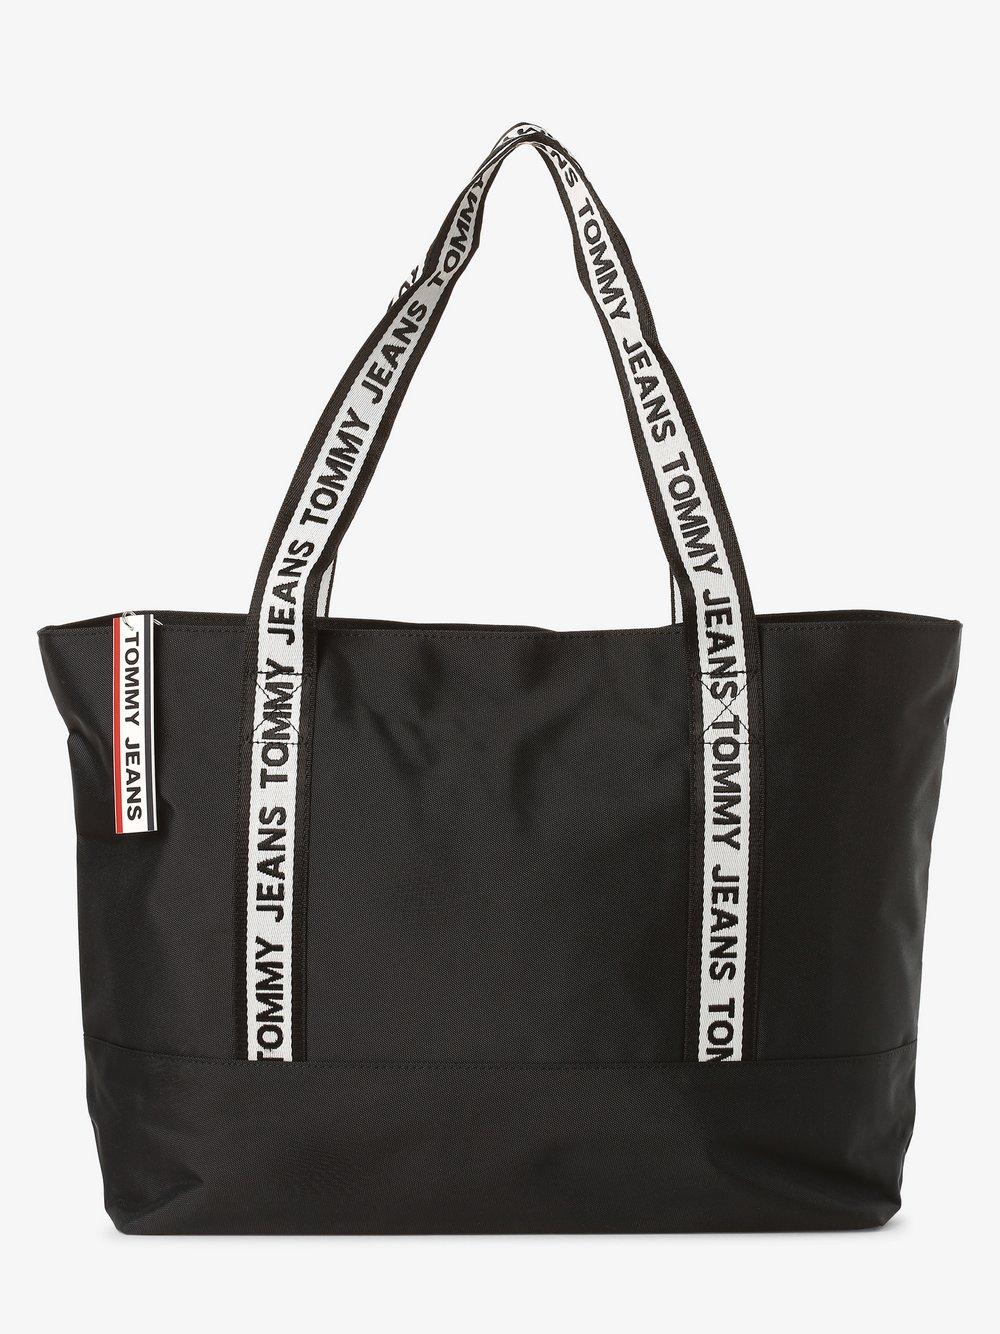 Tommy Jeans - Damska torba shopper, czarny